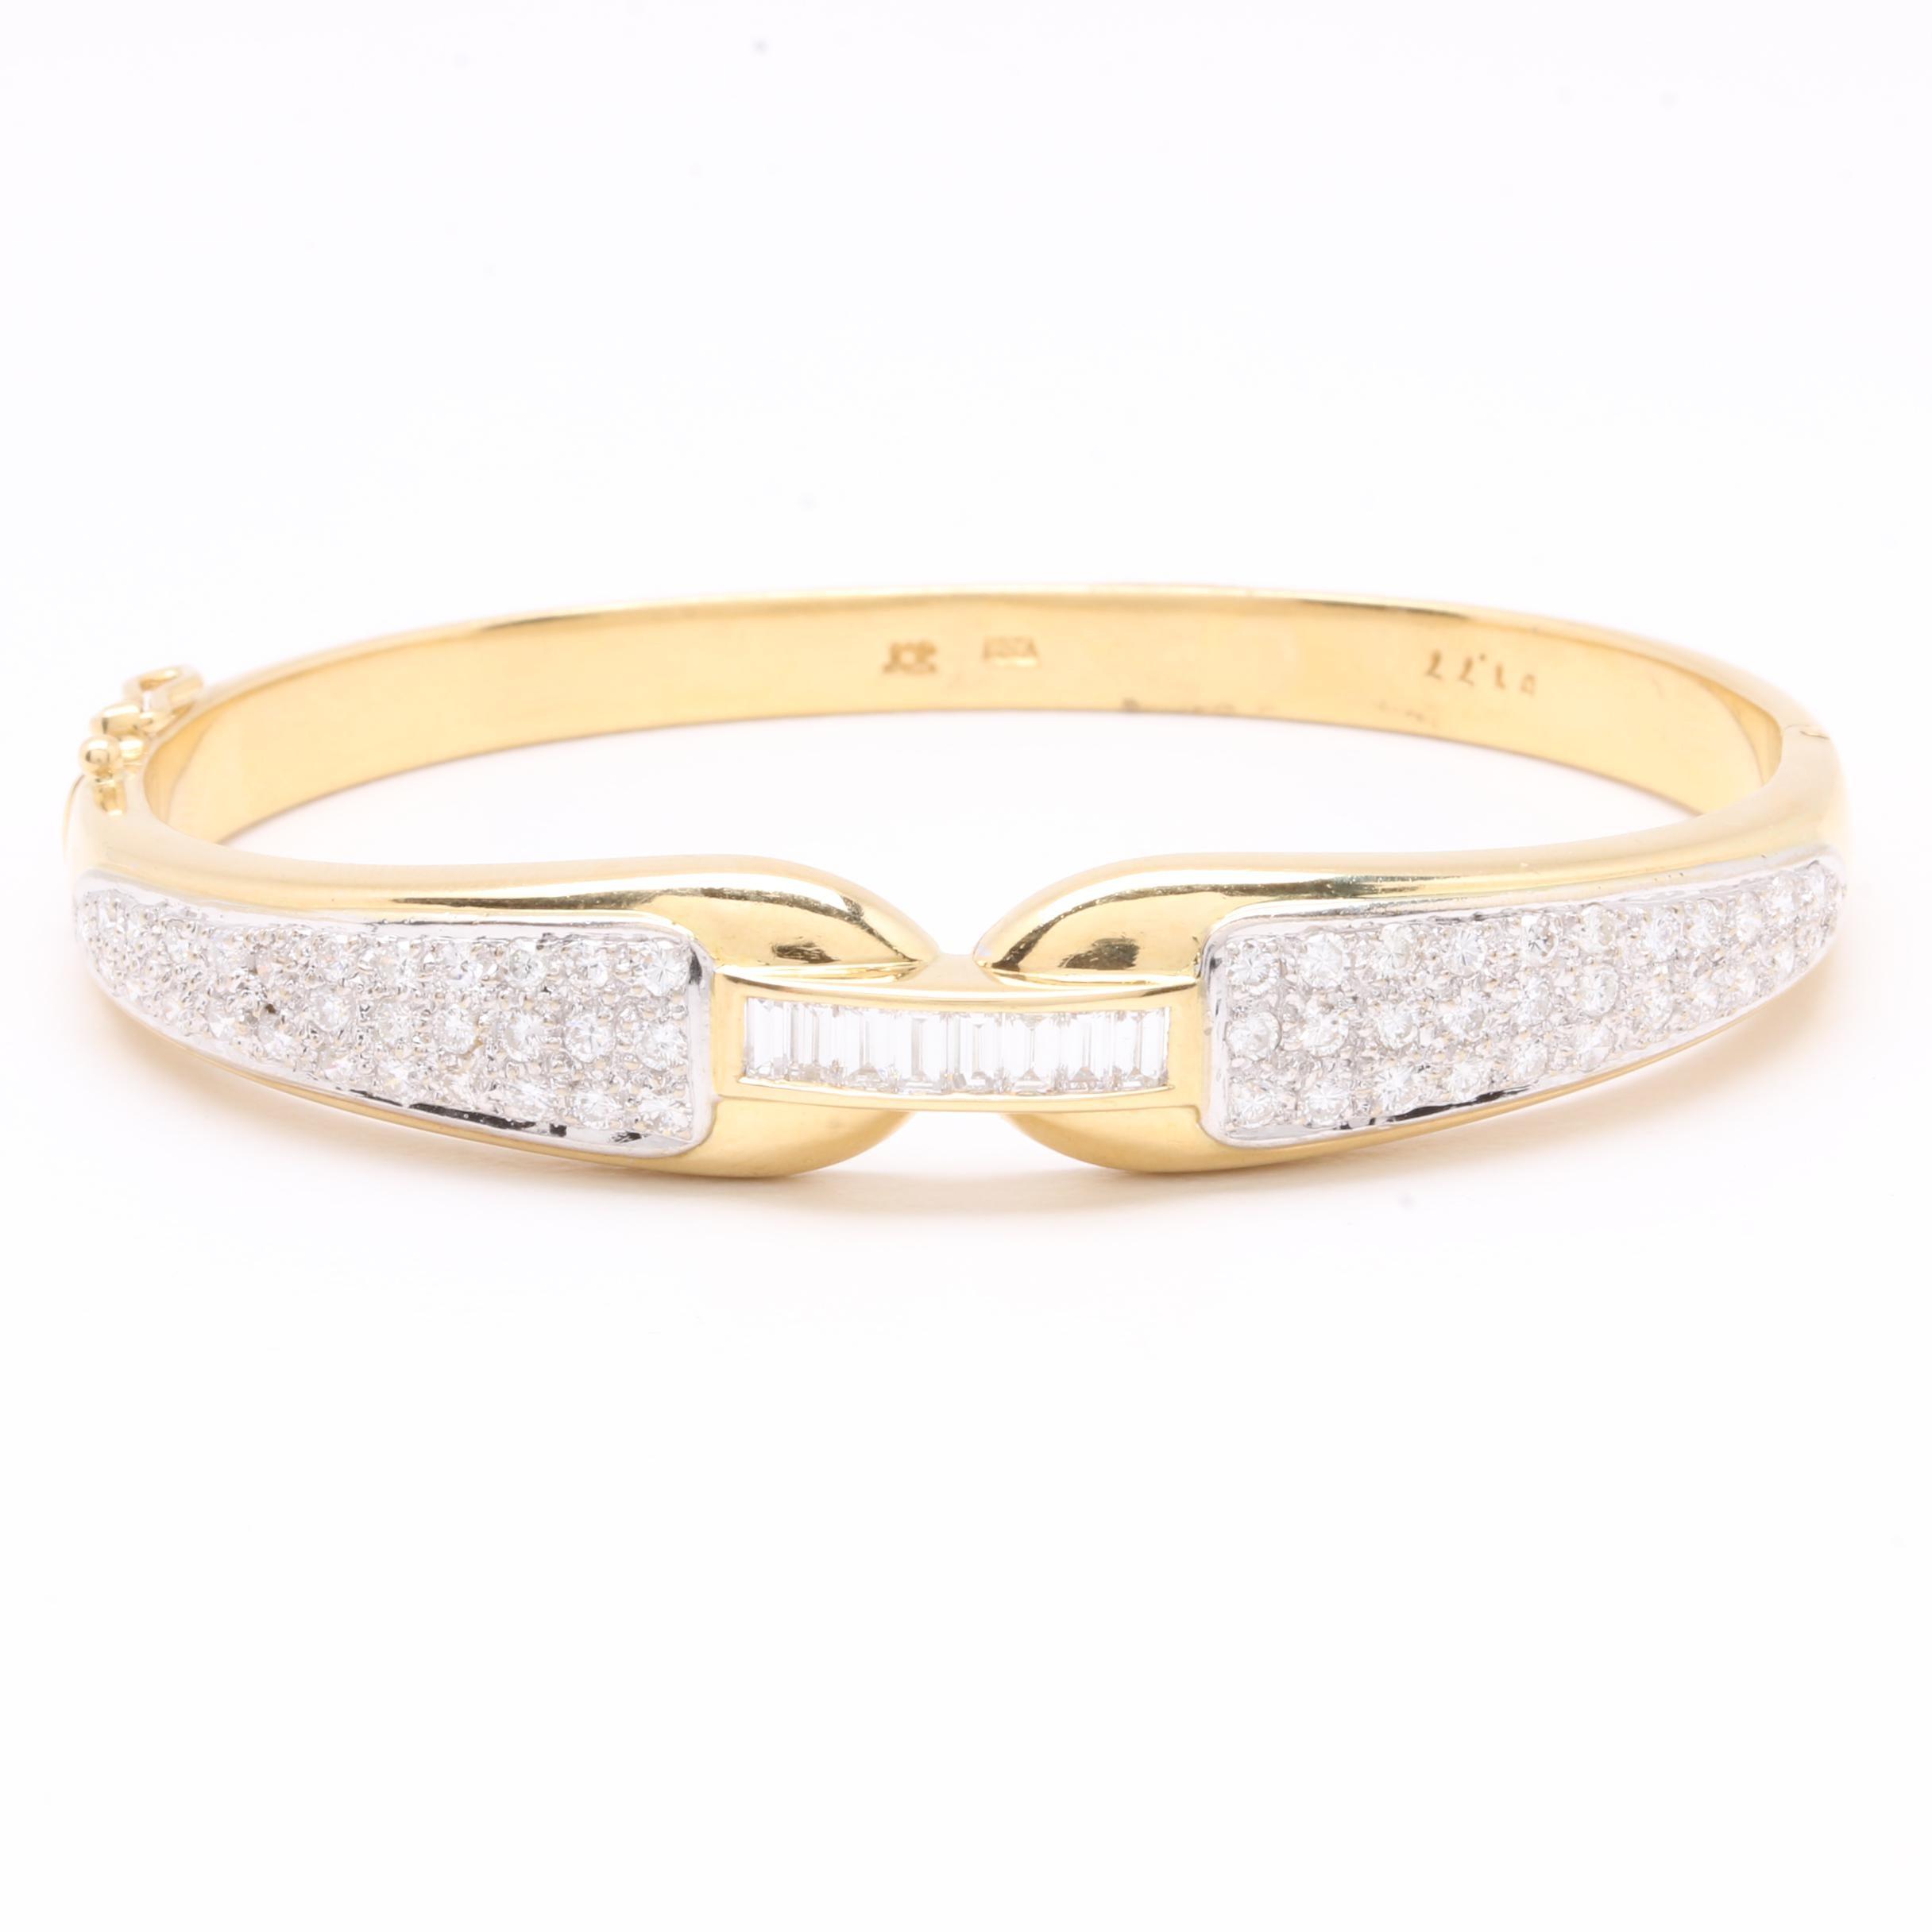 18K Yellow Gold 1.95 CTW Diamond Bangle